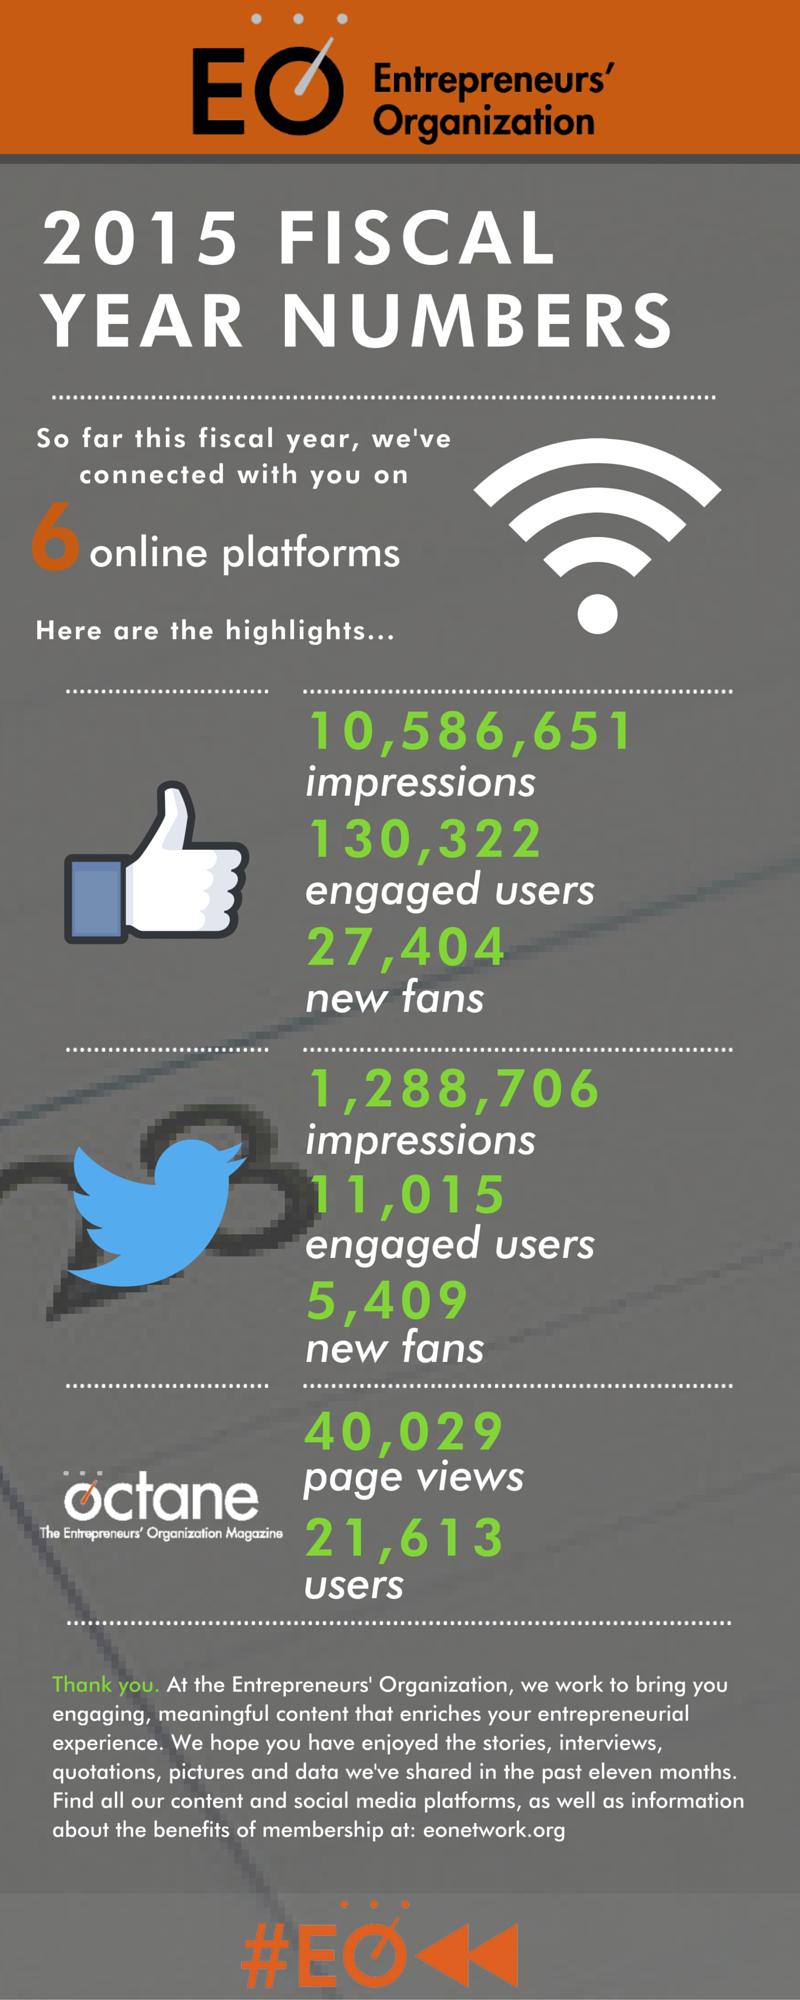 2015 social media metrics infographic